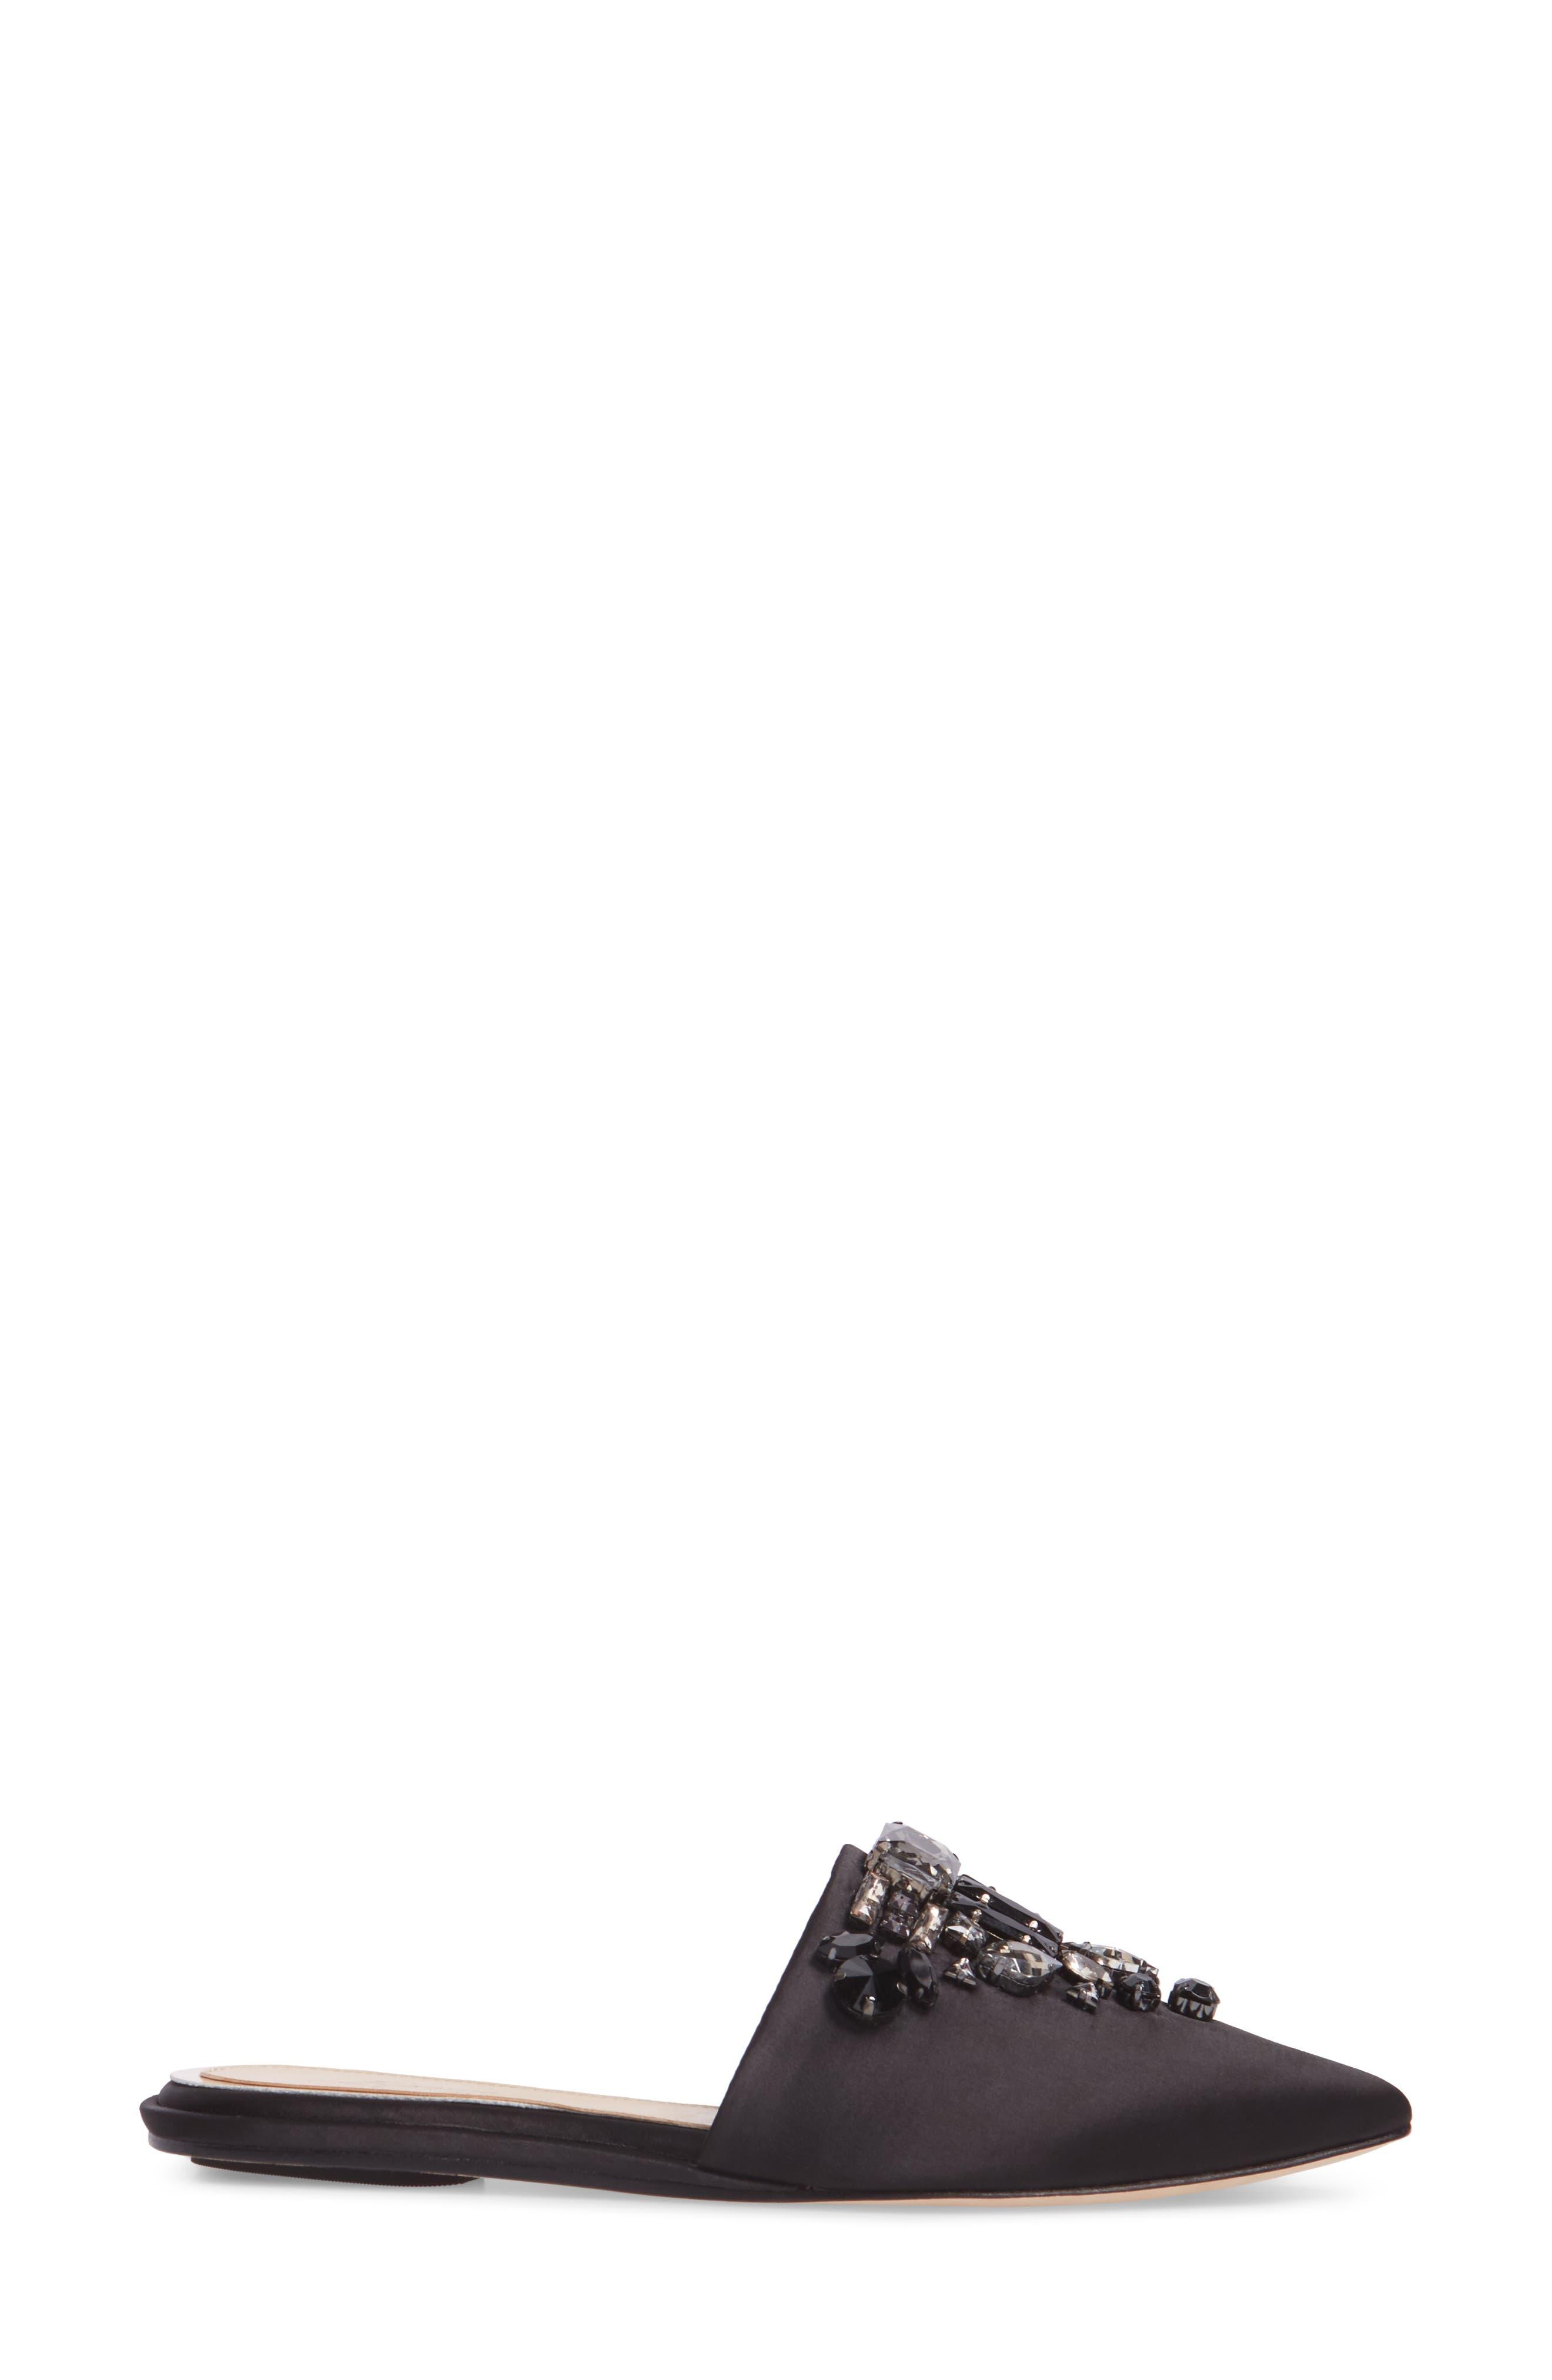 Imagine Vince Camuto Caide Embellished Mule,                             Alternate thumbnail 3, color,                             Black Satin